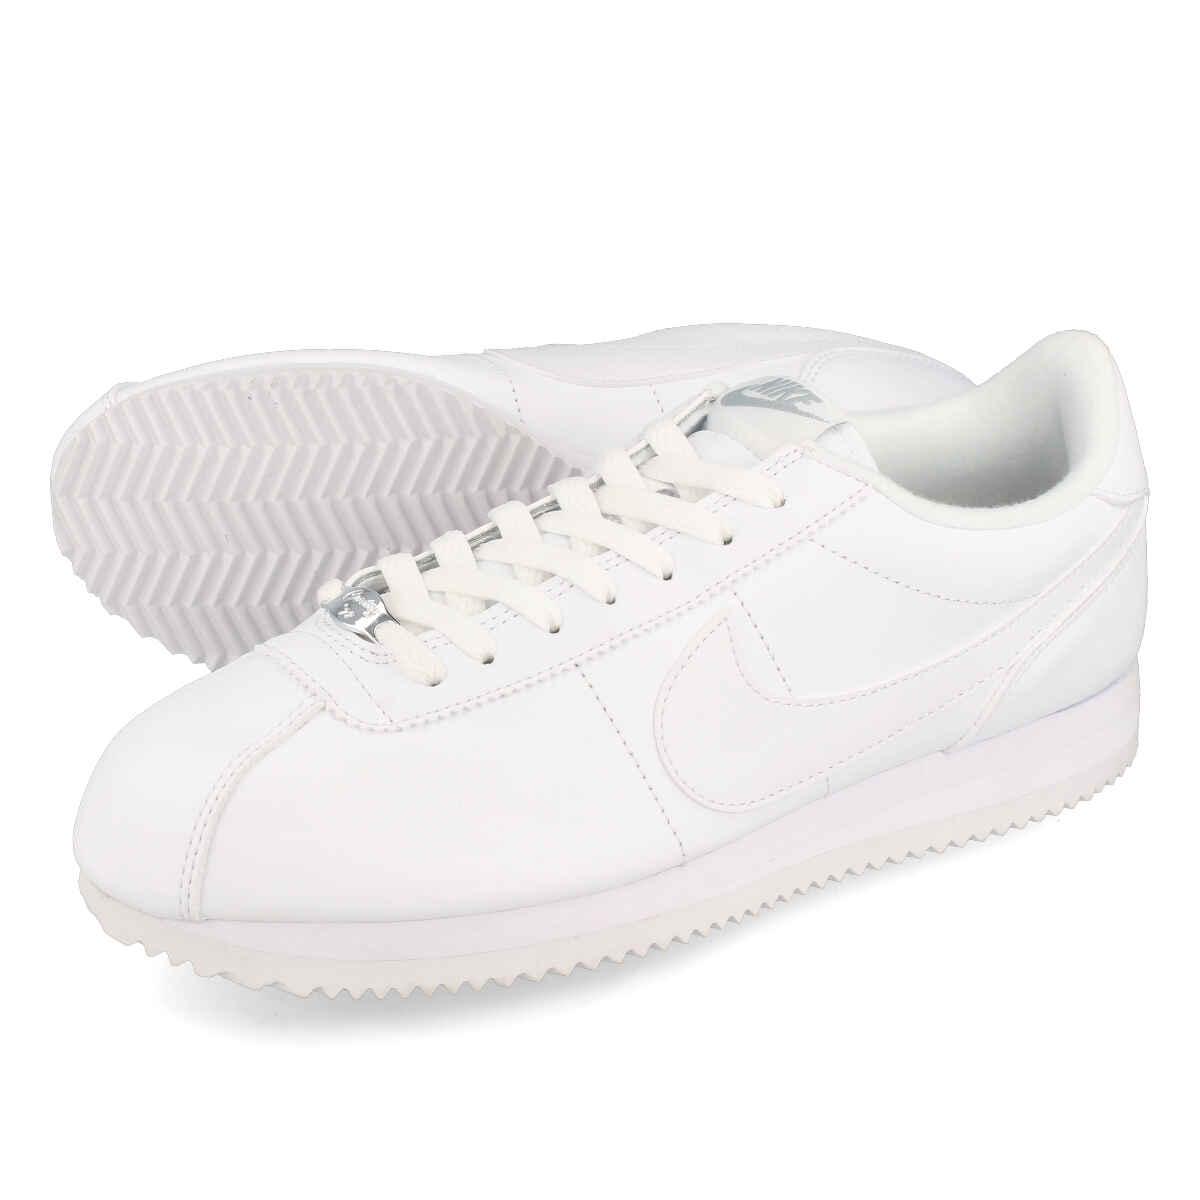 huge selection of 8ab82 6d533 NIKE CORTEZ BASIC LEATHER Nike Cortez basic leather WHITE